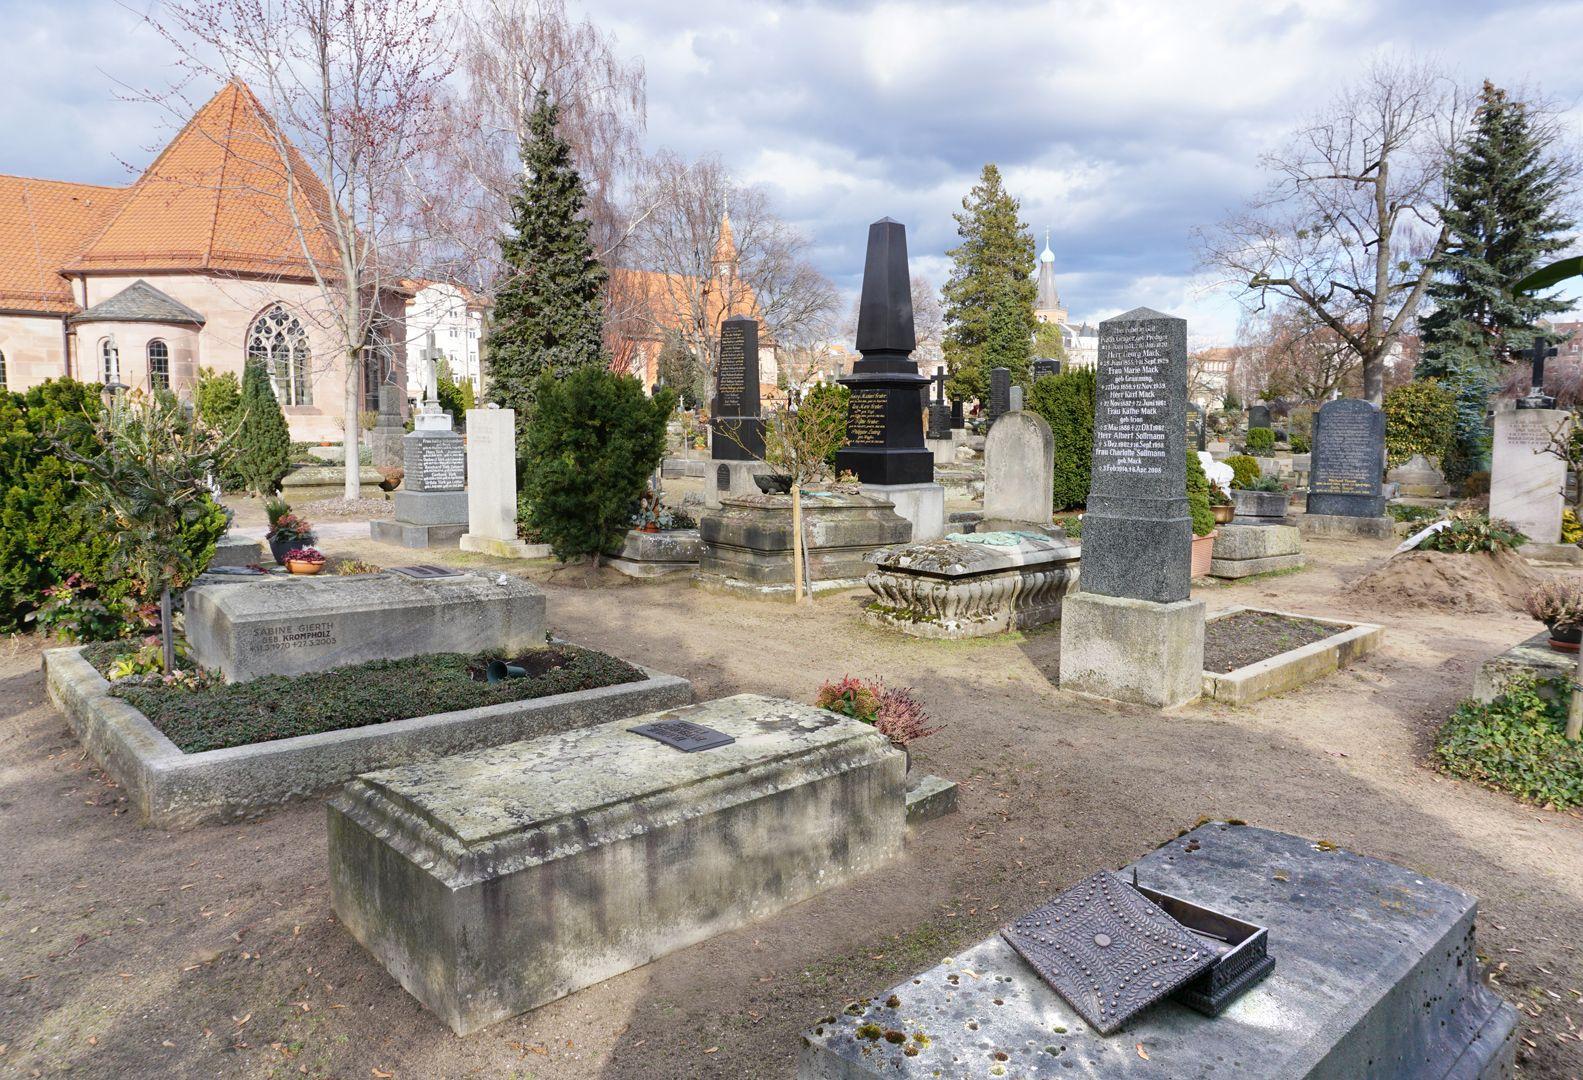 Johannis Cemetery Gravesite II B 15 Location in the burial ground